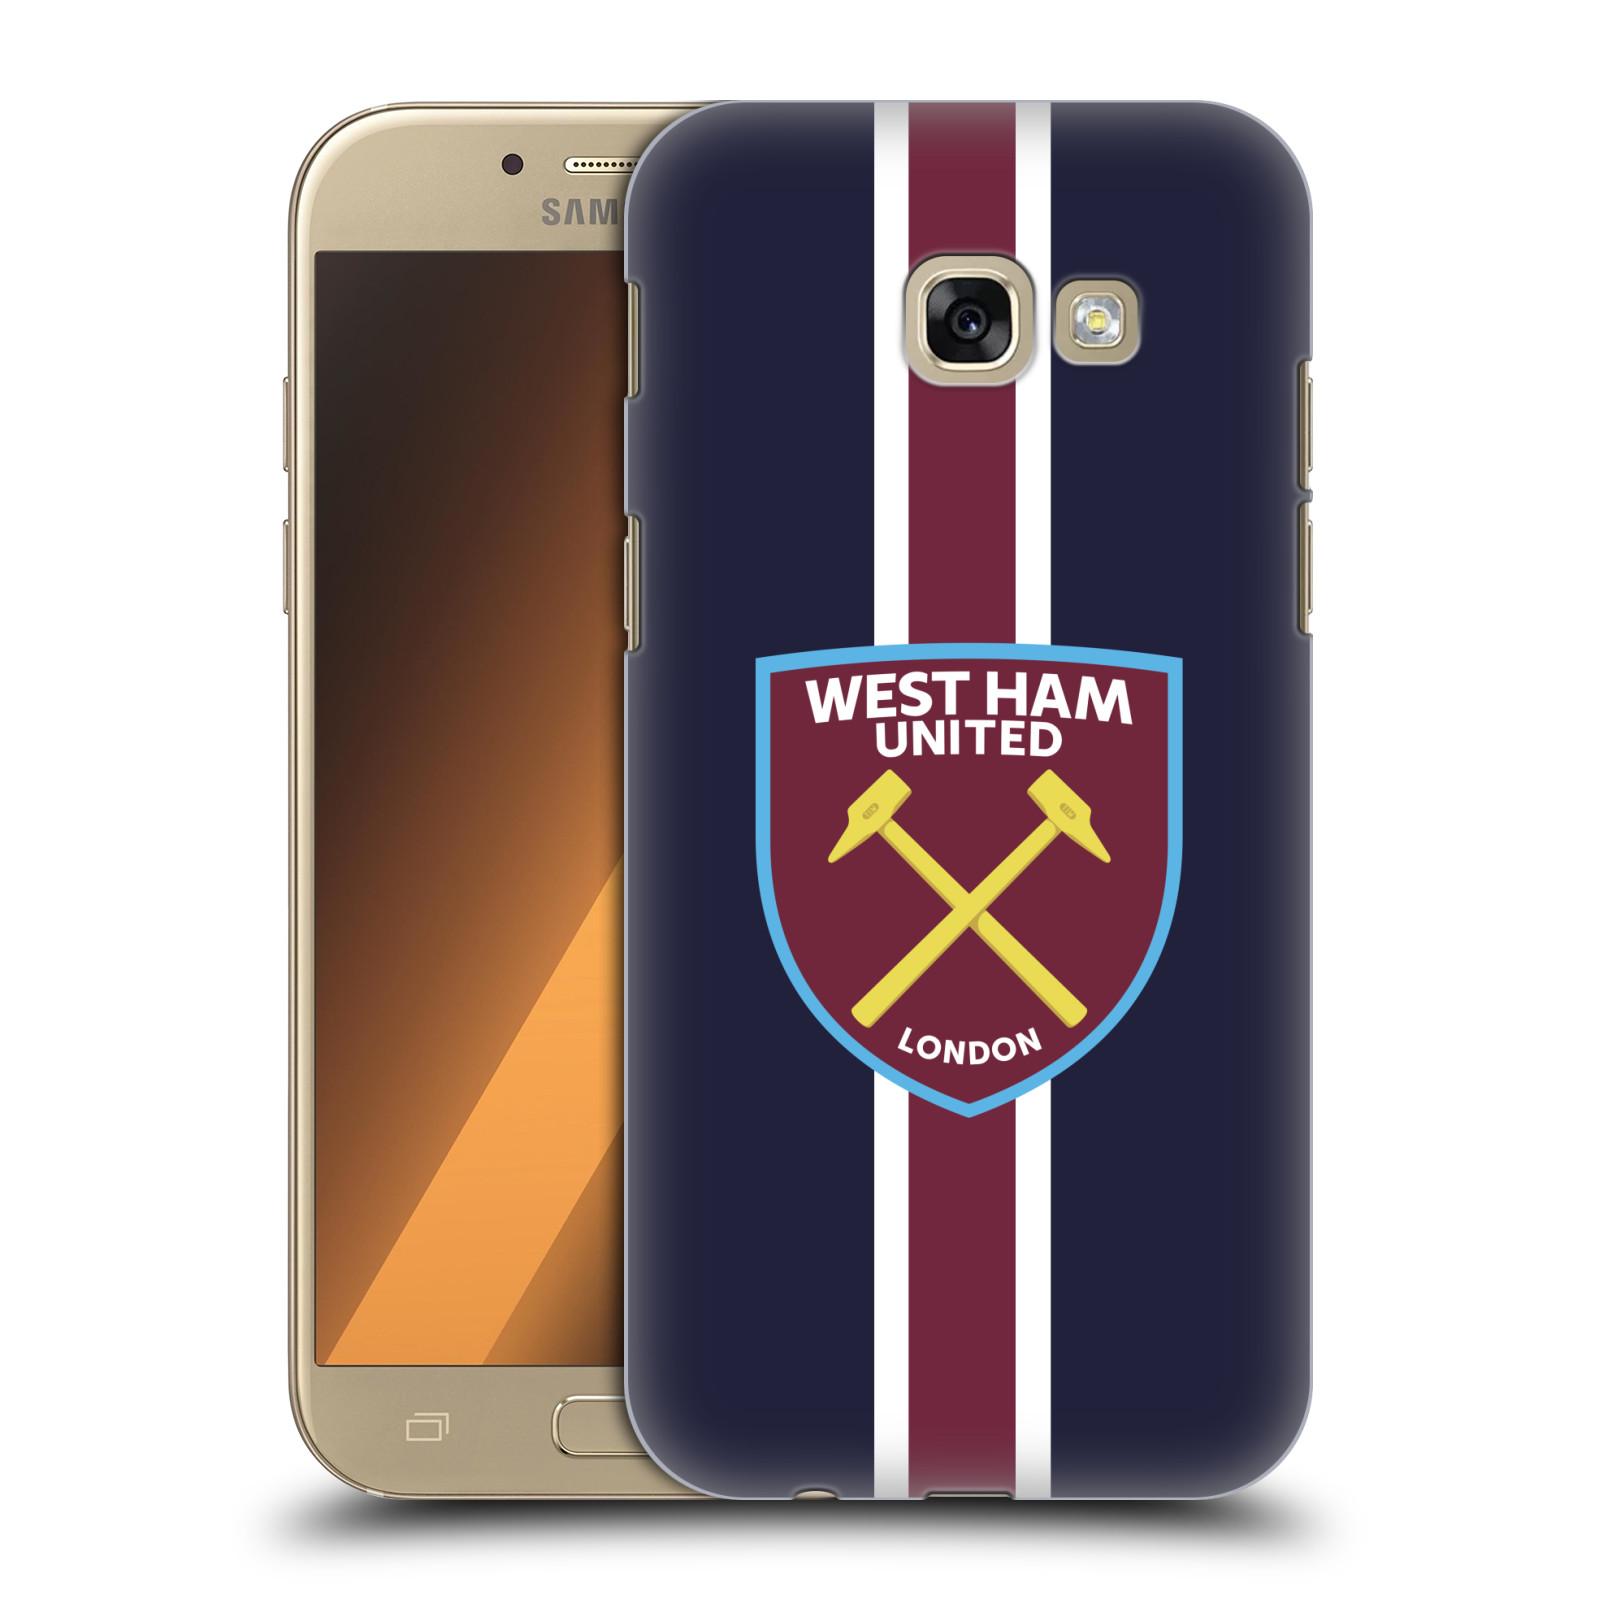 Plastové pouzdro na mobil Samsung Galaxy A5 (2017) - Head Case - West Ham United - Pruhy